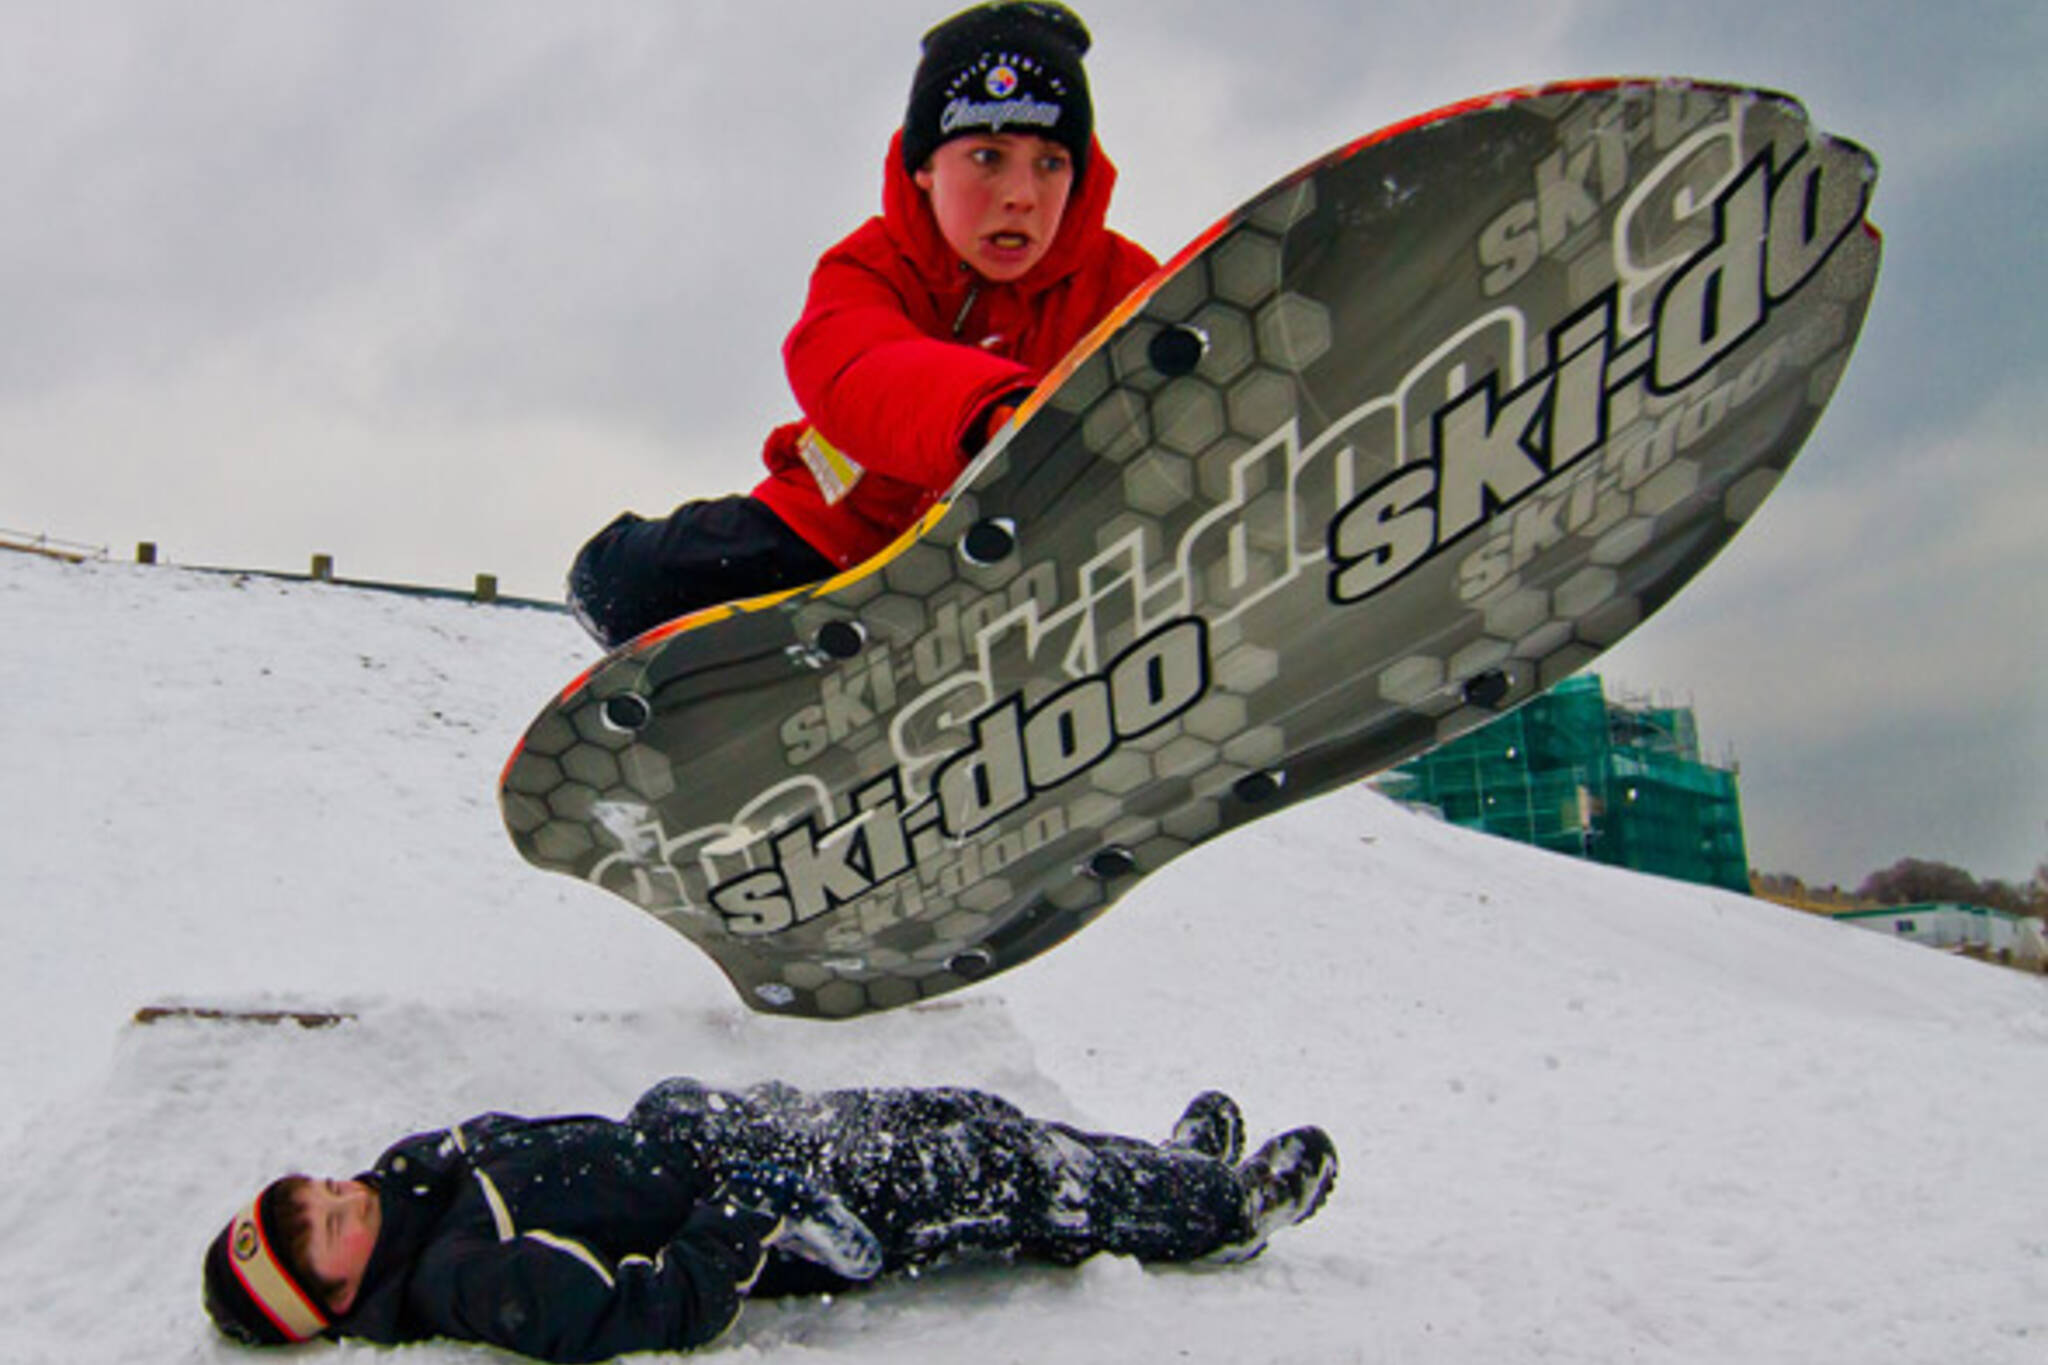 Snowboarding Toronto